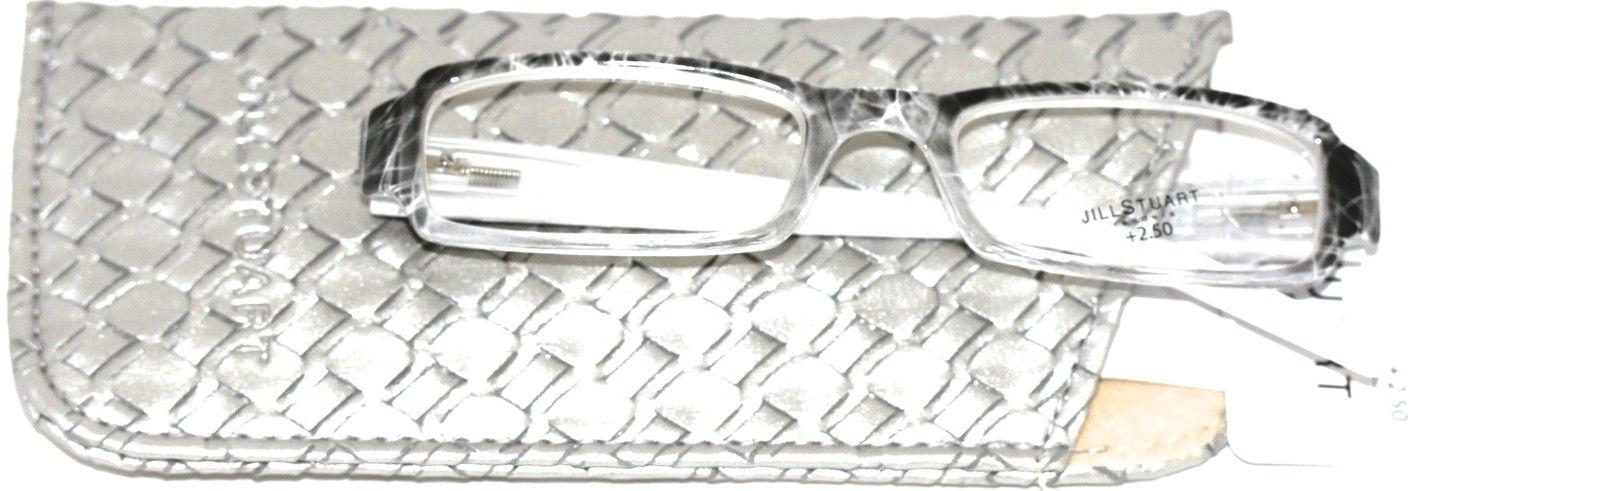 Jill Stuart Reading Glasses JSR3 Grey Marble Fade Plastic 2.5 Power